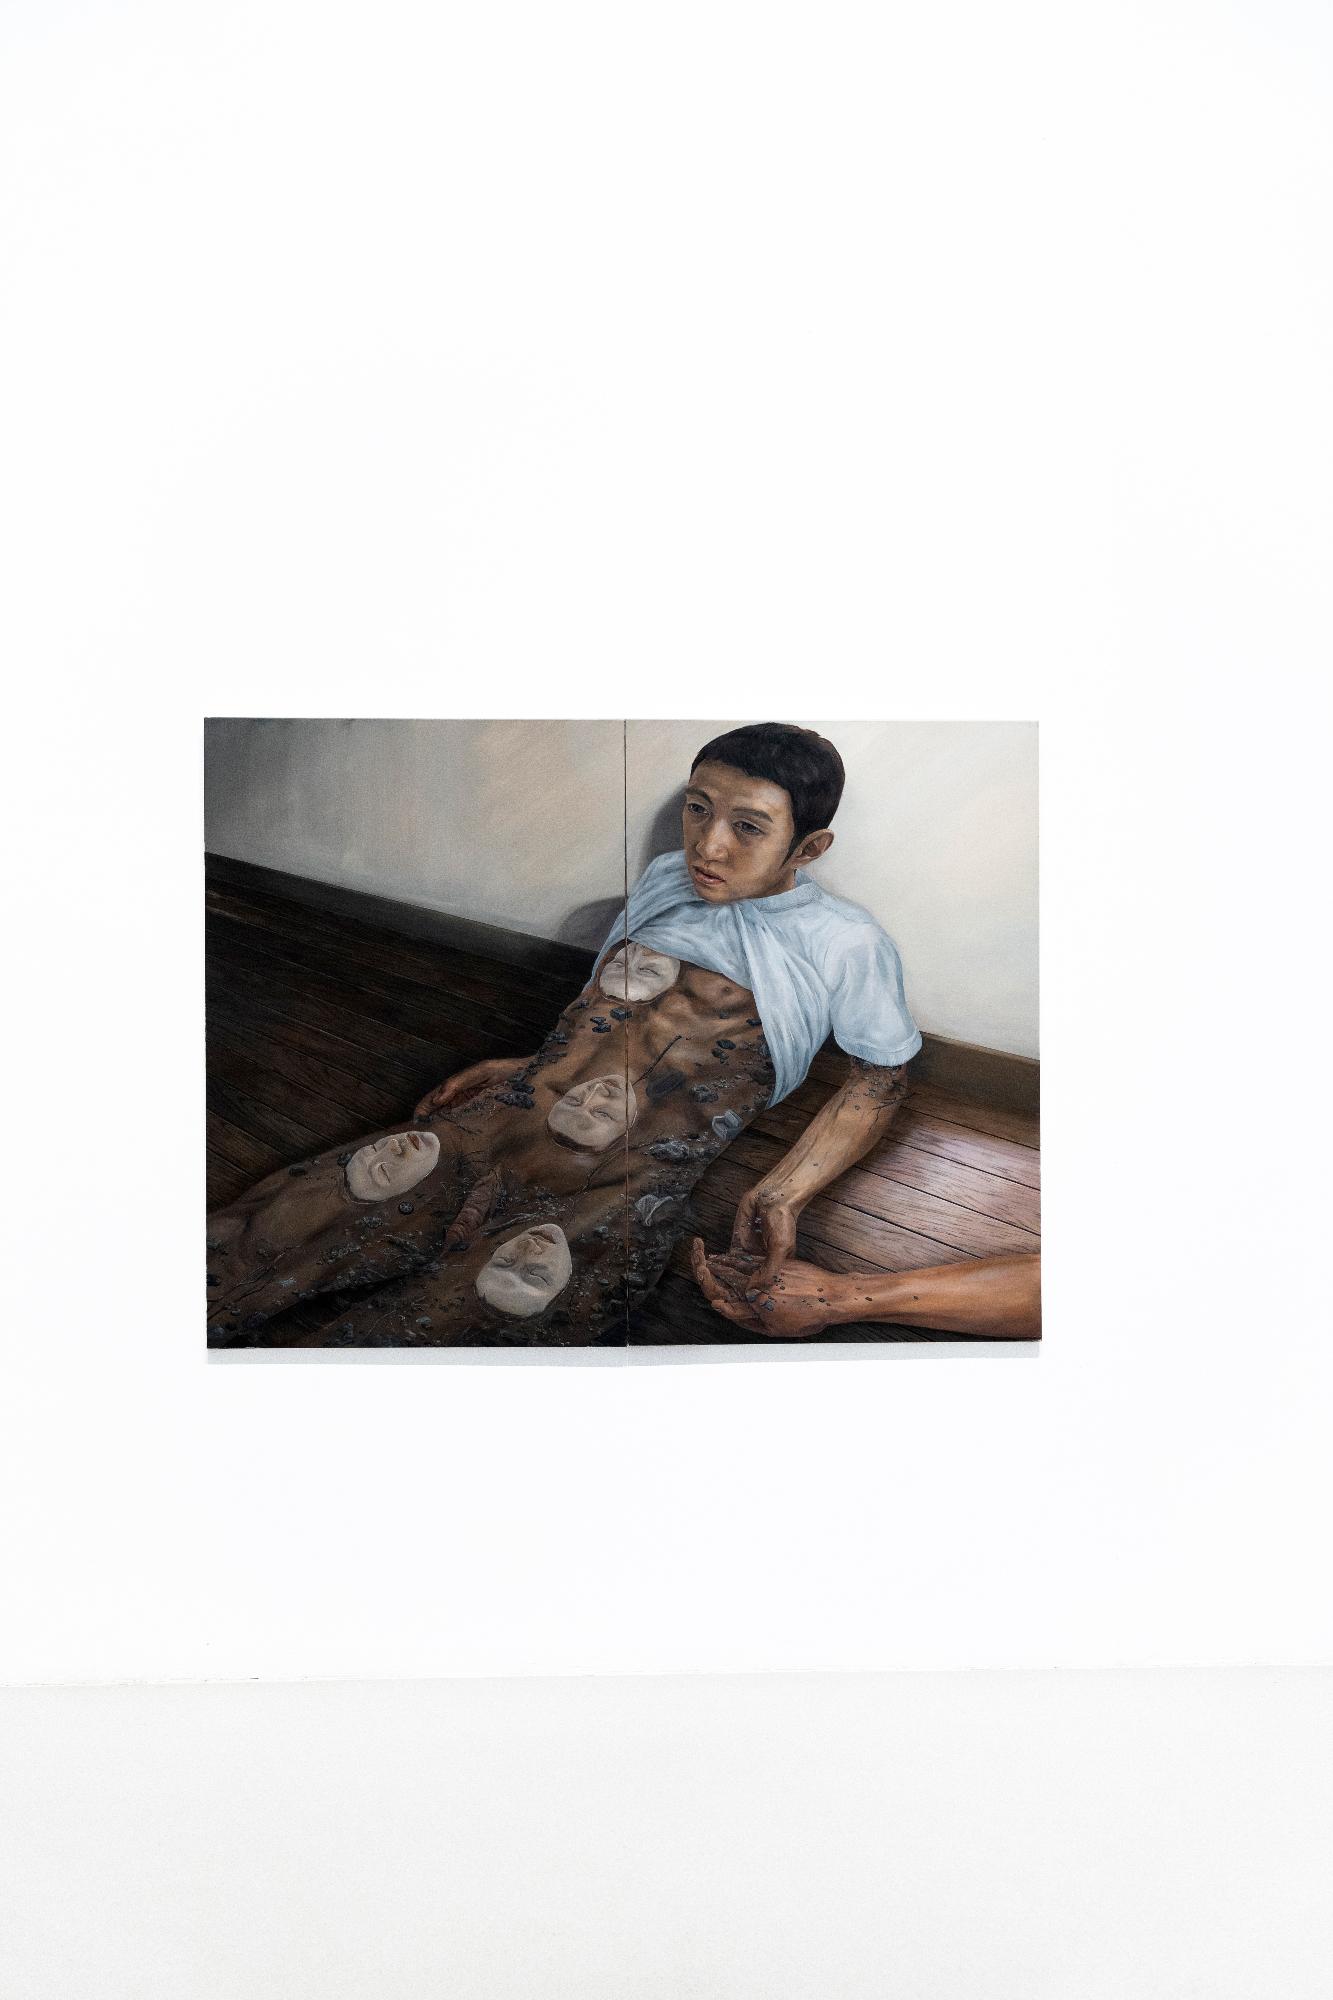 CaballeroCosmica-ExhibitionPhoto-Tetsuya-Ishida-palaciovelazquez-24-p.jpg